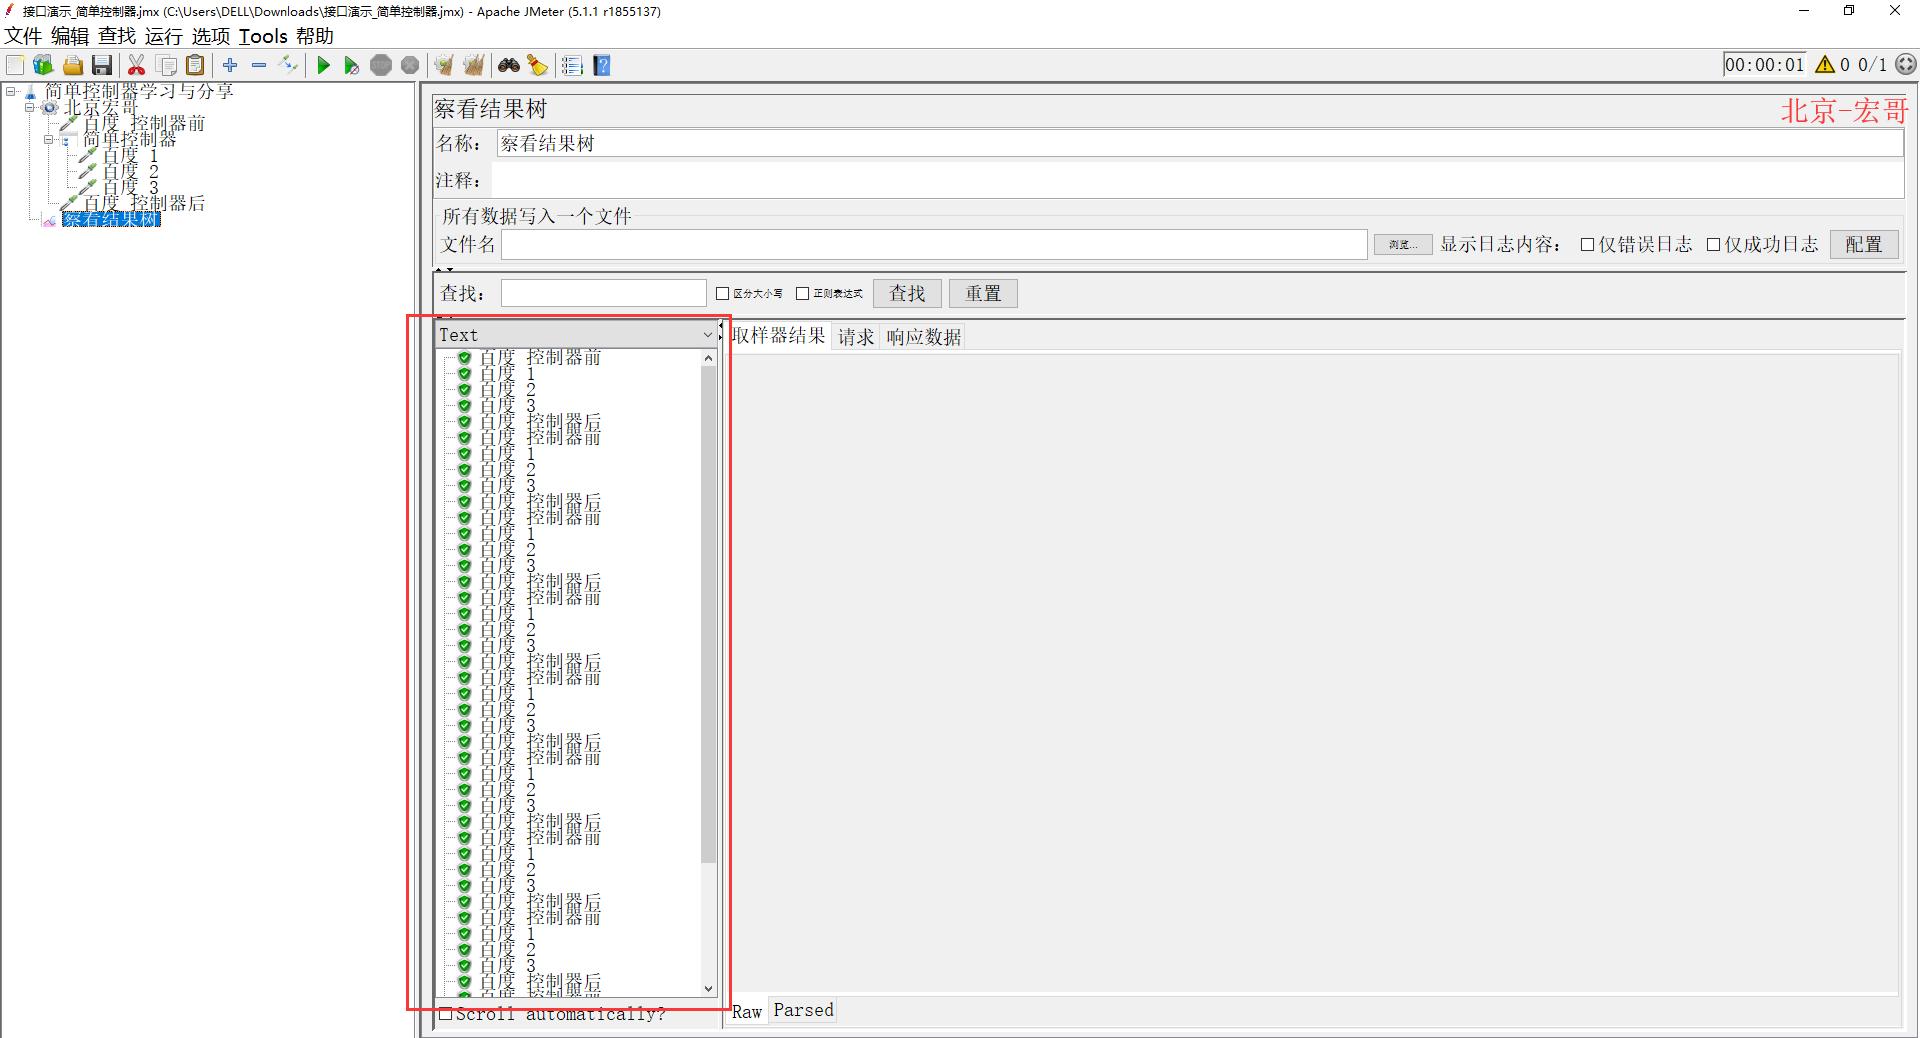 Jmeter(十二) - 从入门到精通 - JMeter逻辑控制器 - 终篇(详解教程)